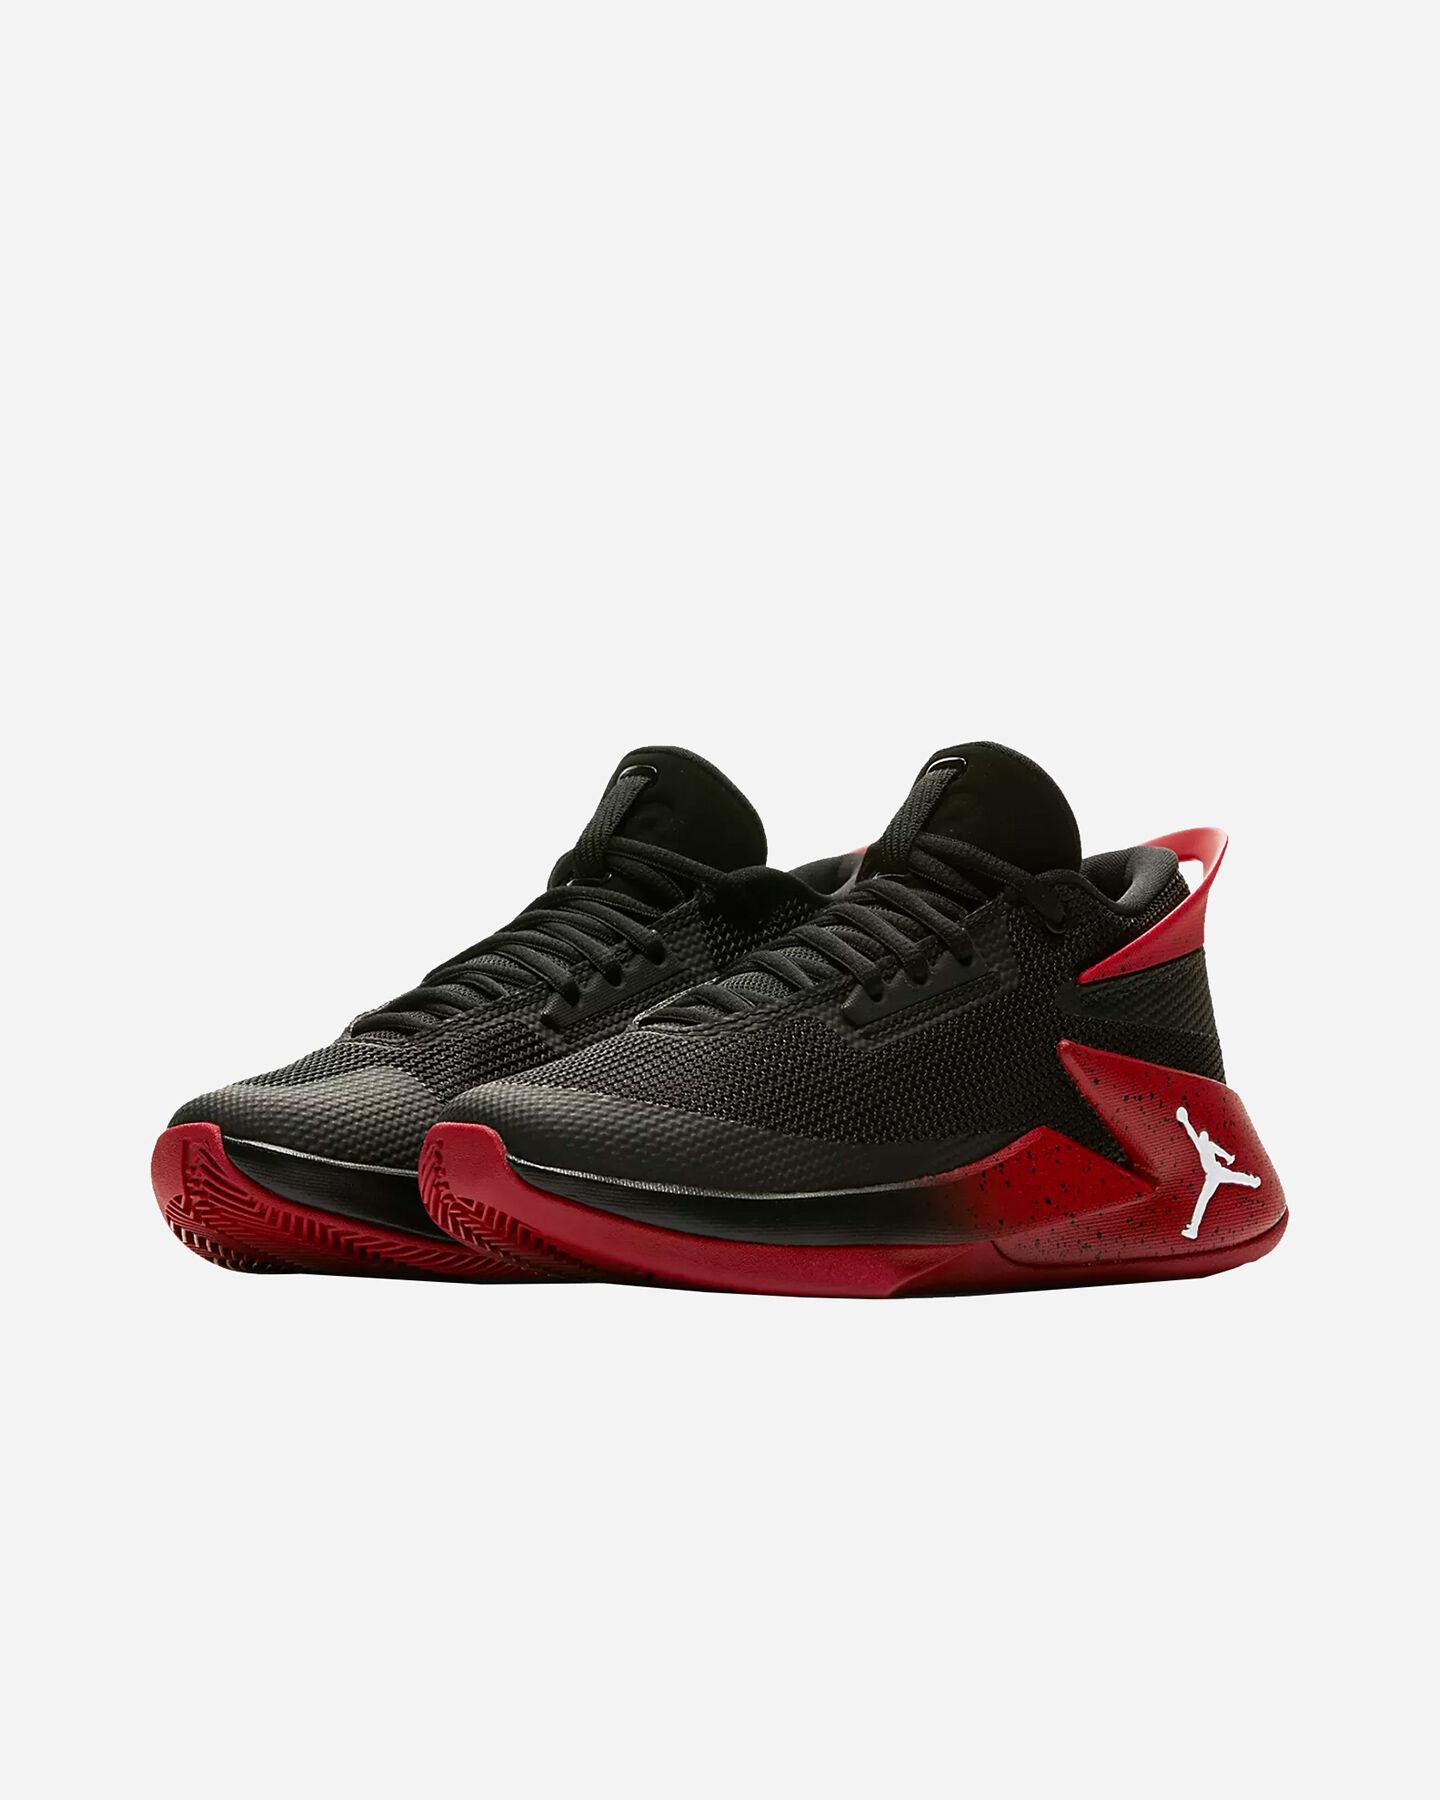 f2751fdbcf Fly Lockdown Jr Nike Scarpe Basket Su Ao1547 023 Cisalfa Sport Jordan  EqAffgx5